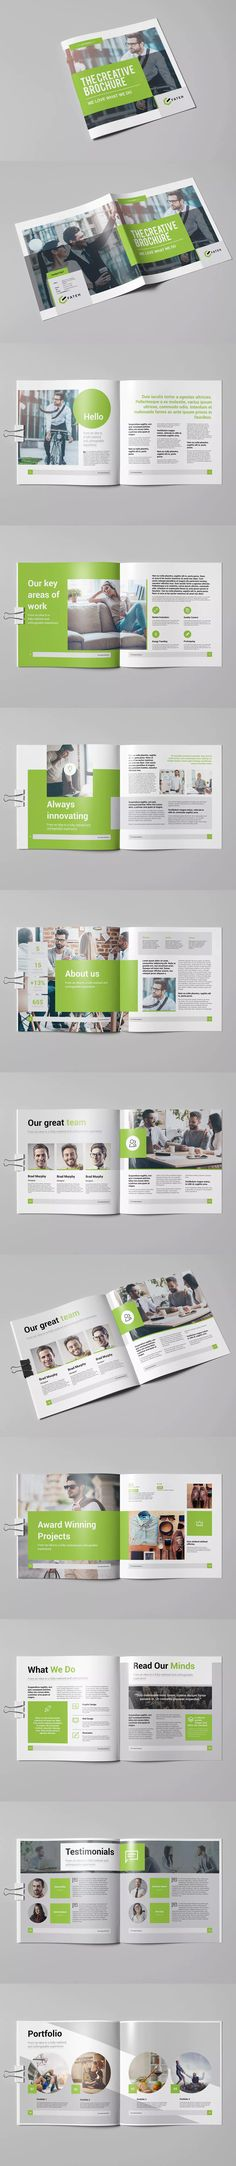 The Creative Square Brochure Template InDesign INDD #unlimiteddownloads